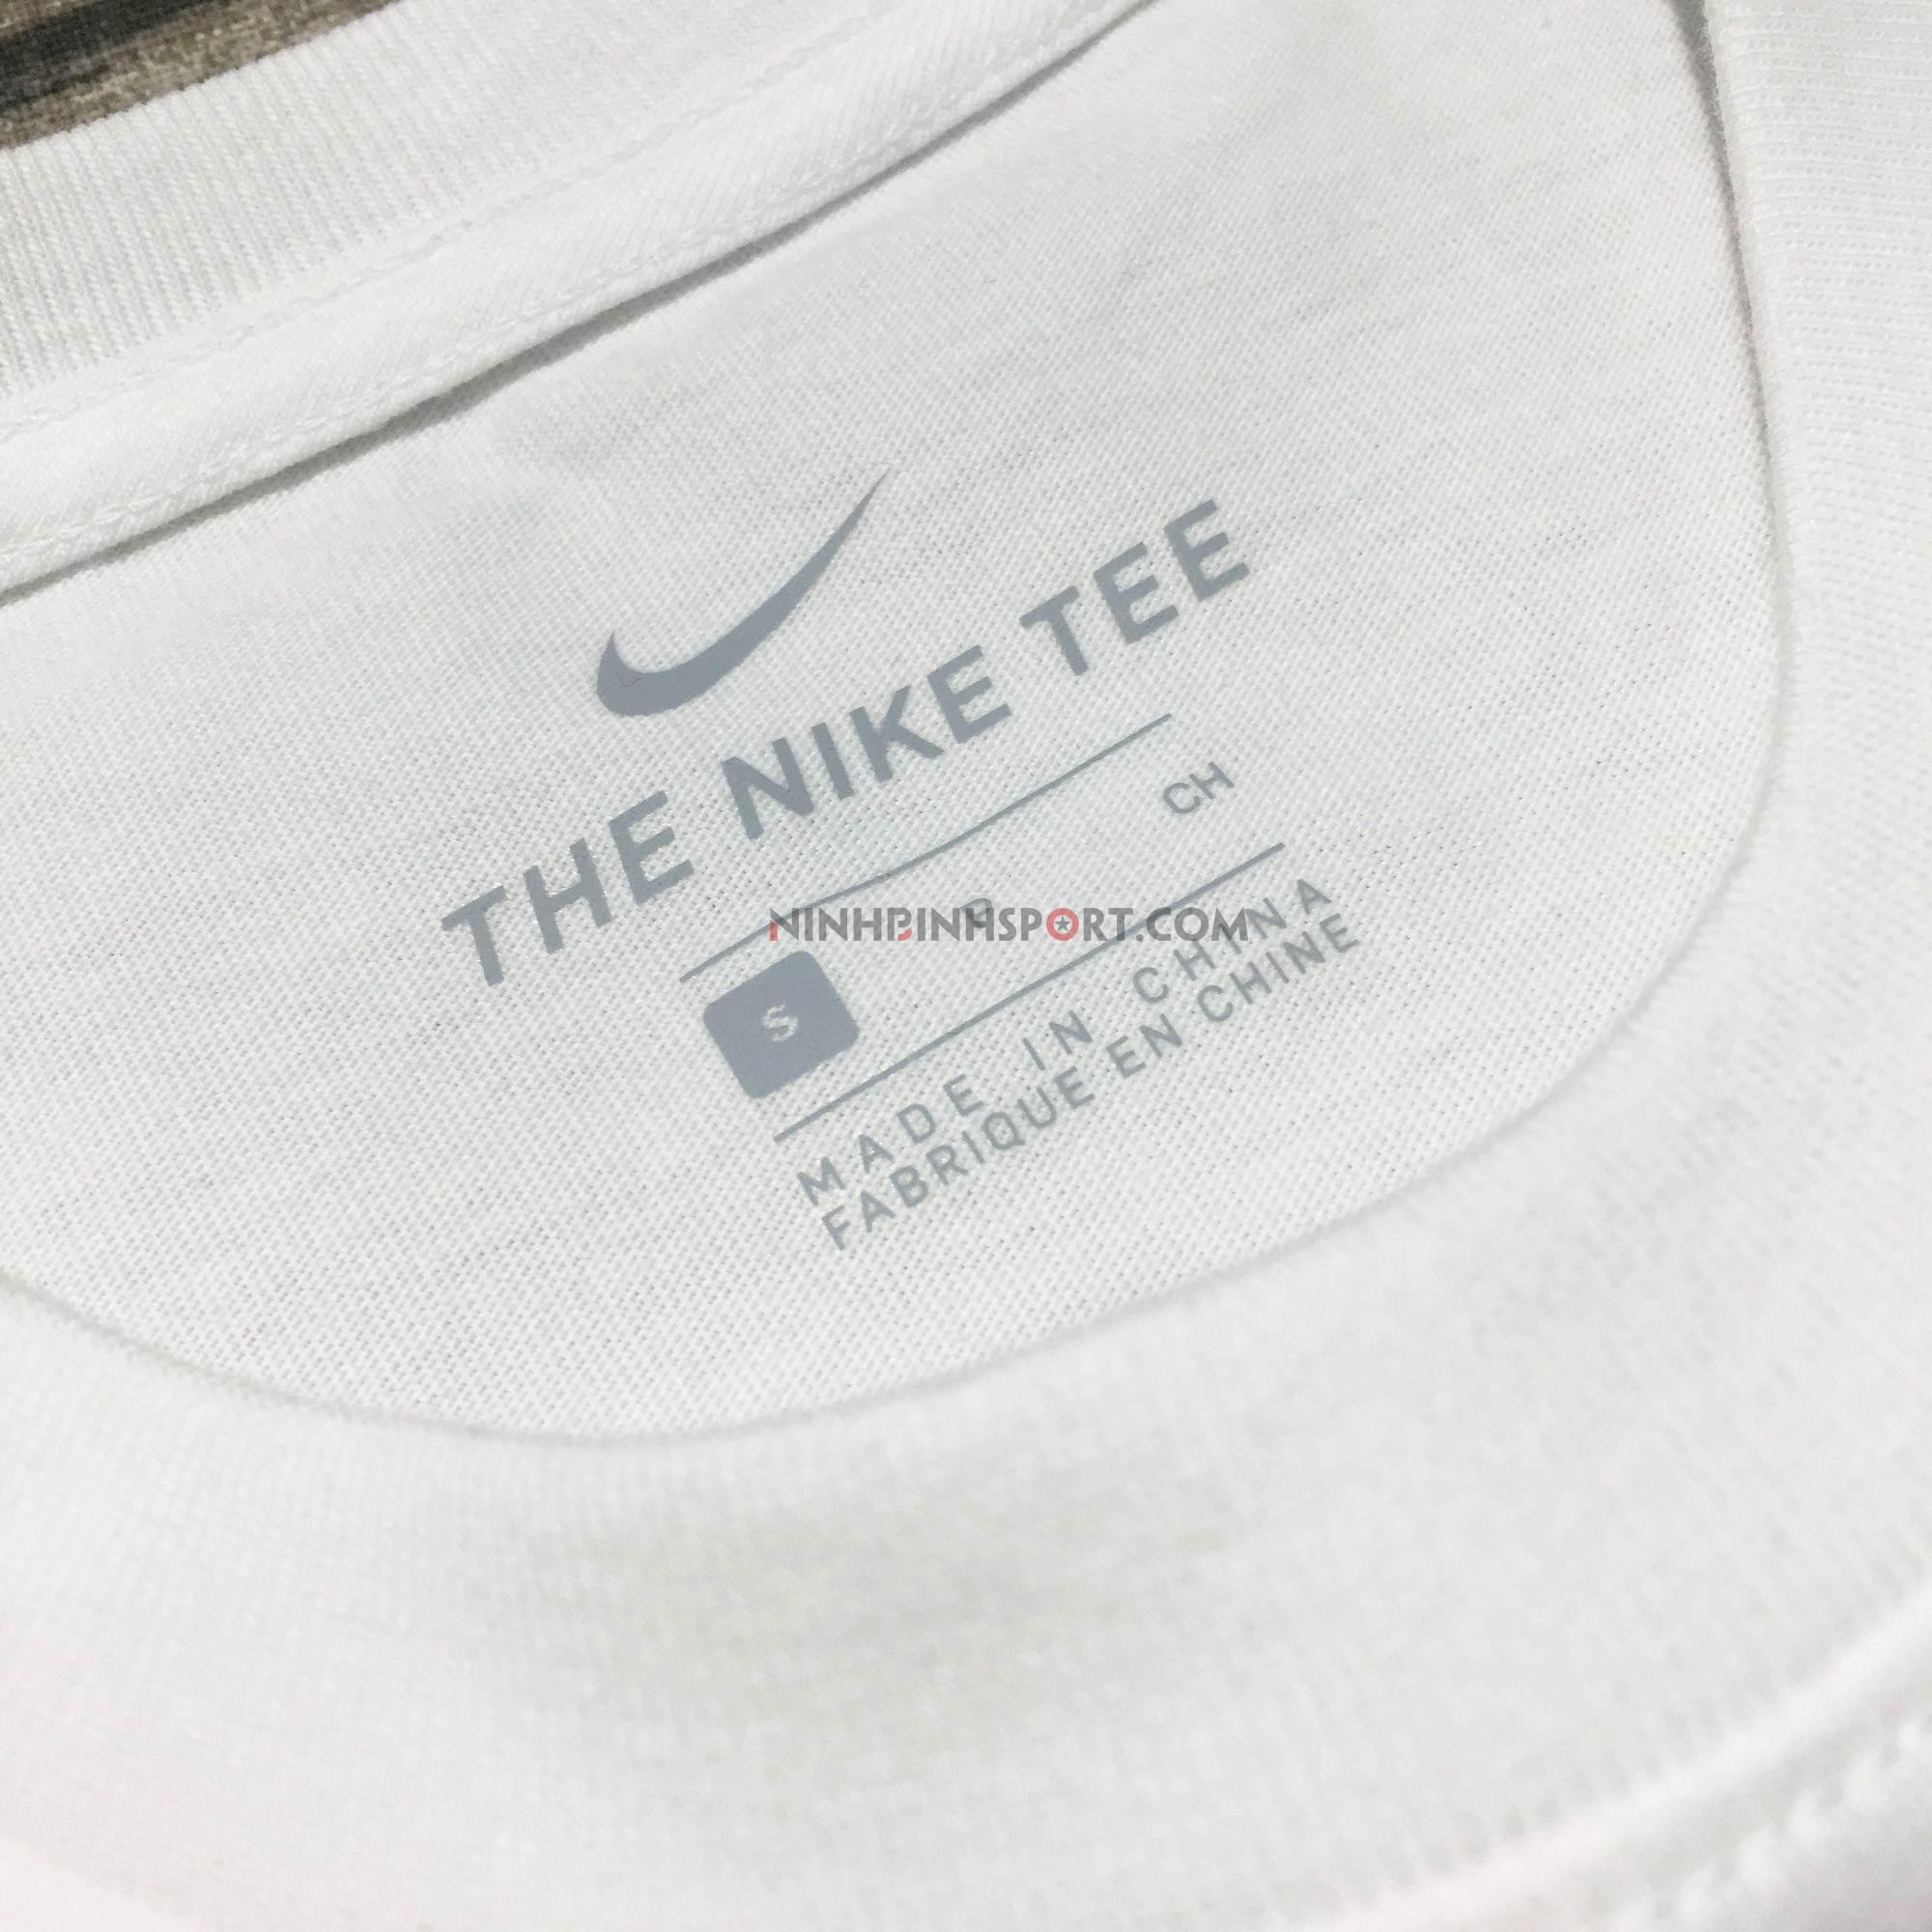 Áo thể thao nam Nike Sportwear Tee BQ0703-100